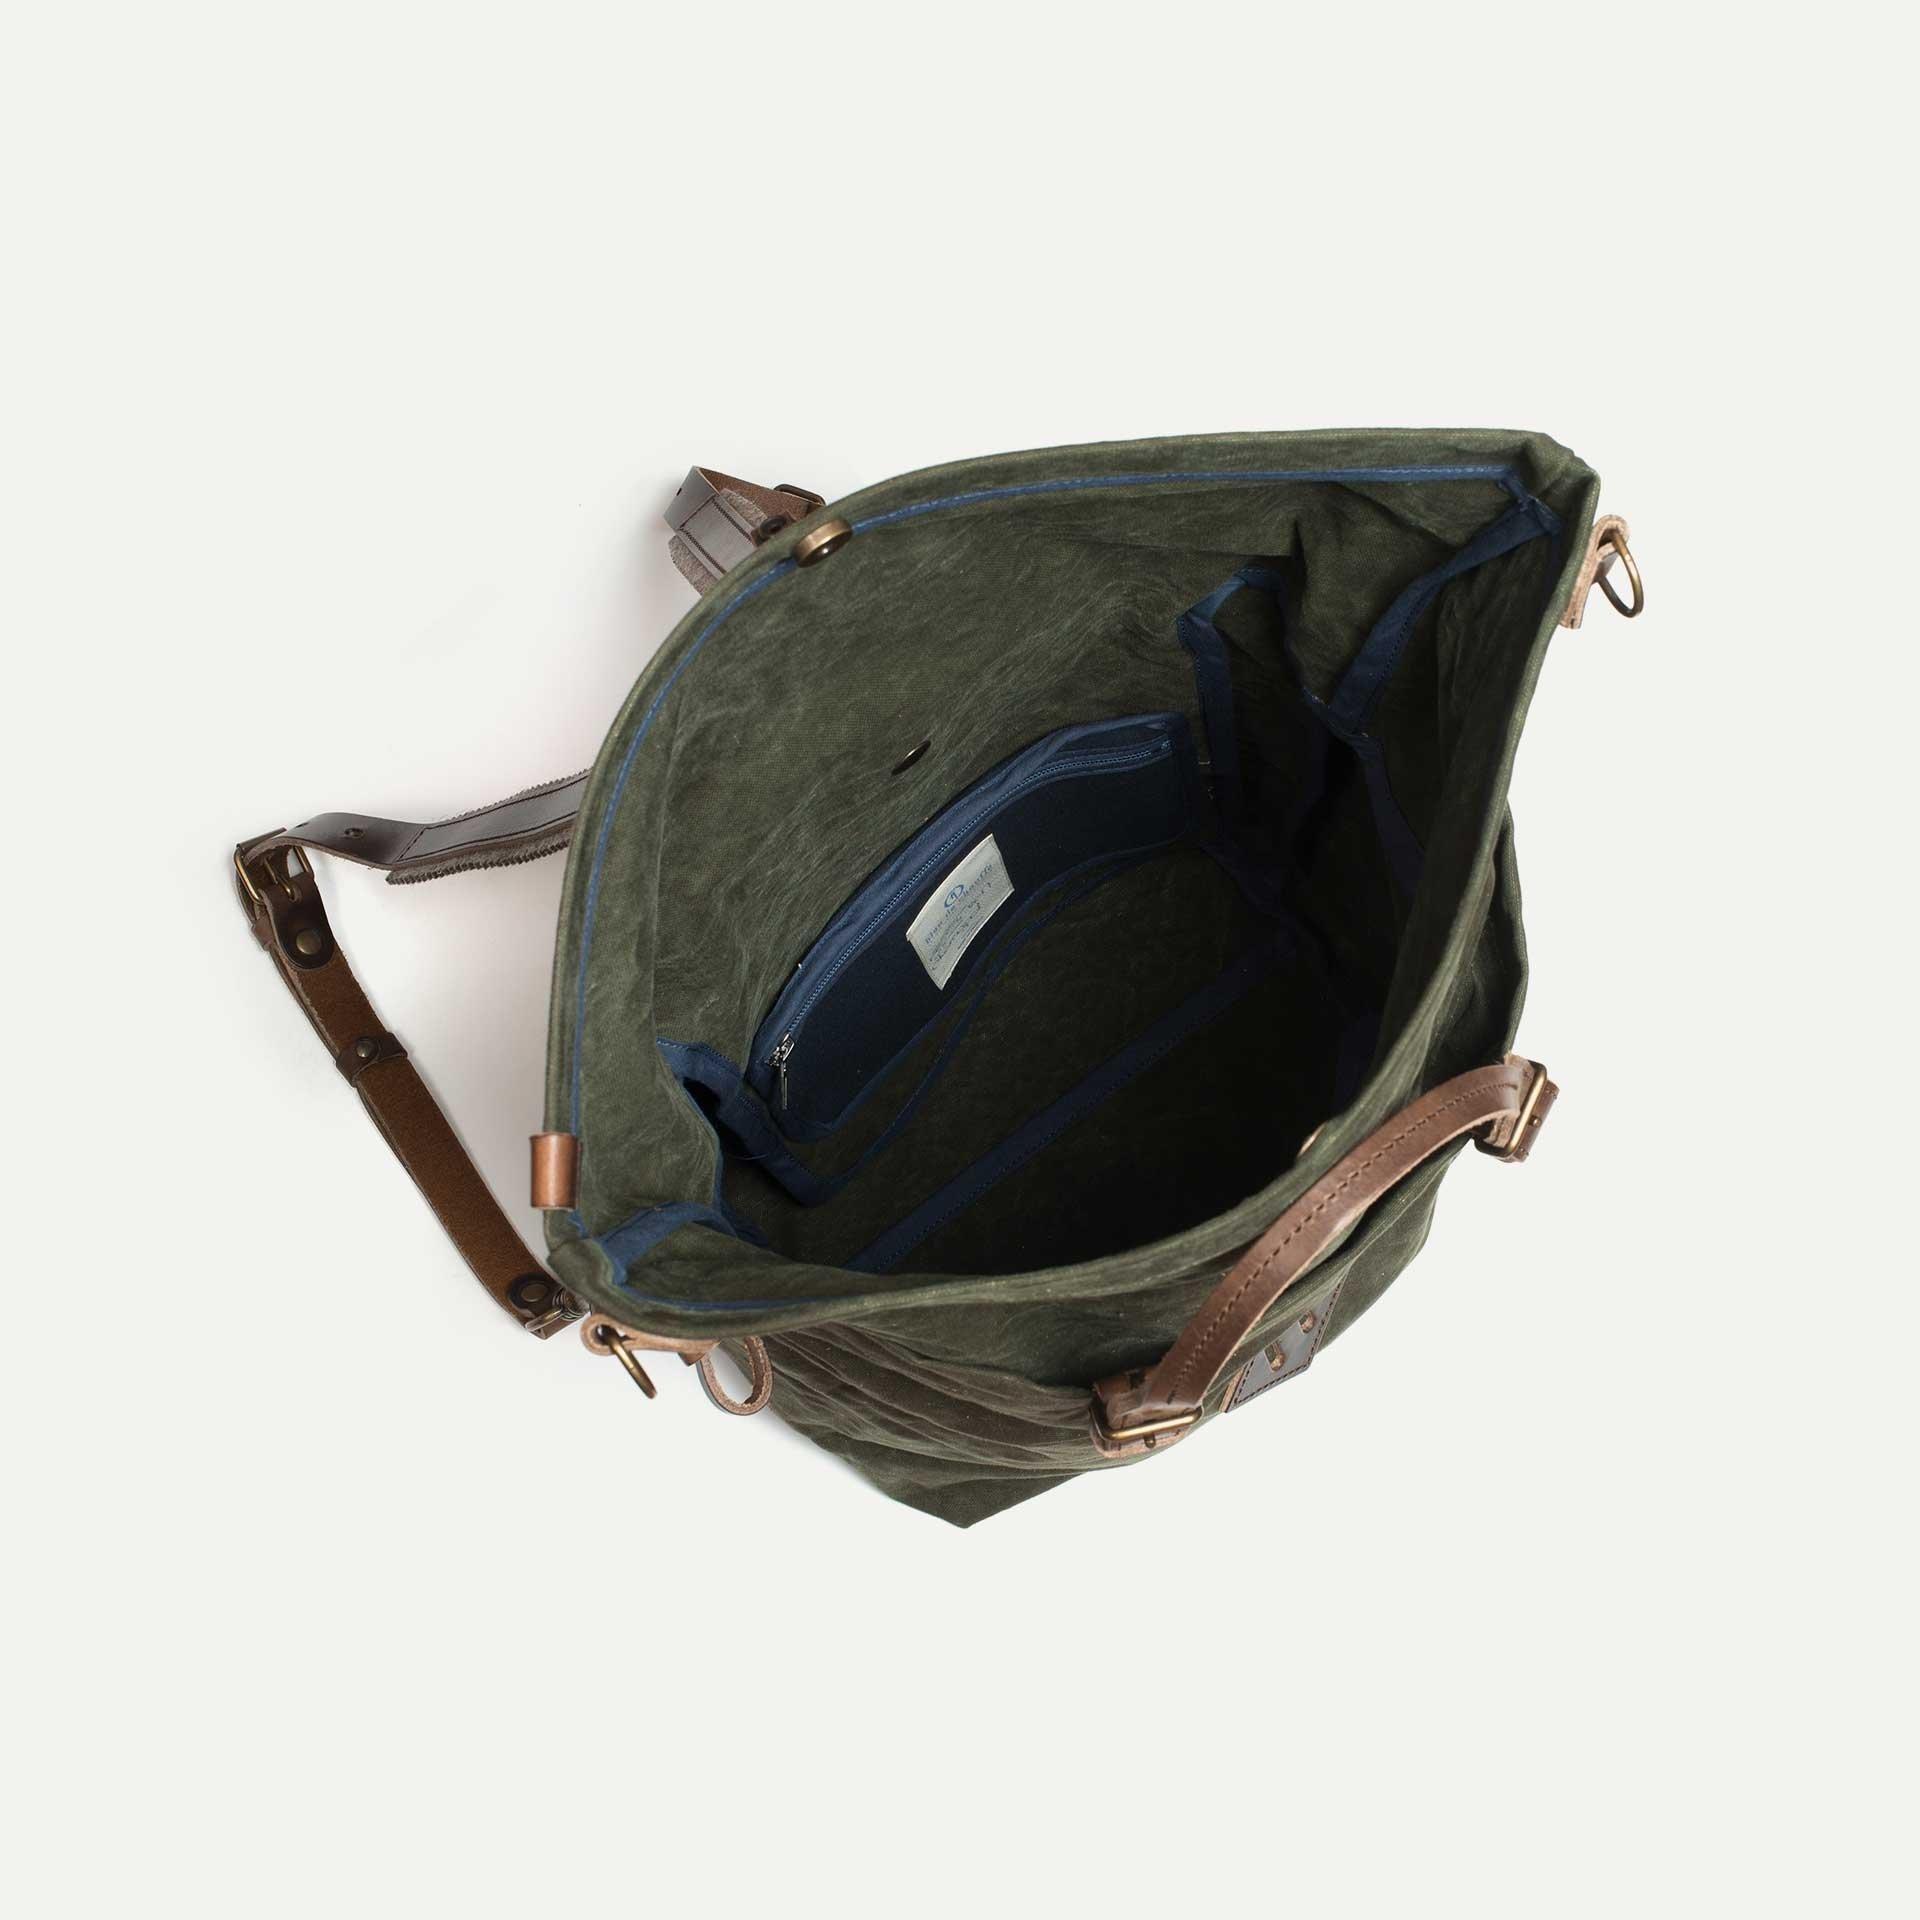 Woody M Backpack - Dark Khaki (image n°4)